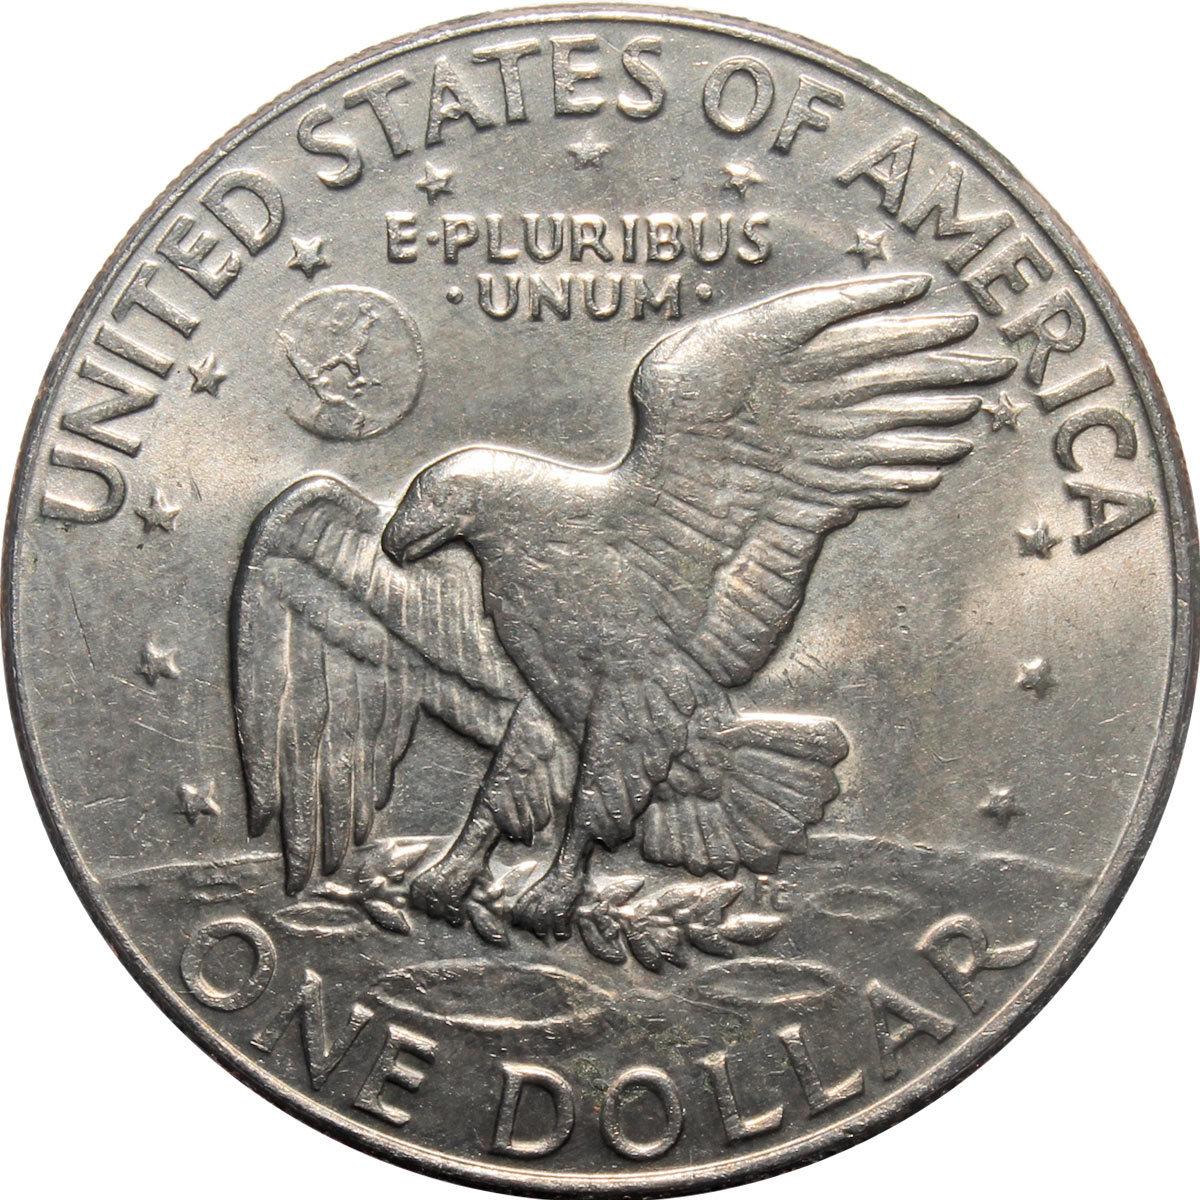 1 доллар 1974 (D) США Эйзенхауэр (Лунный). XF